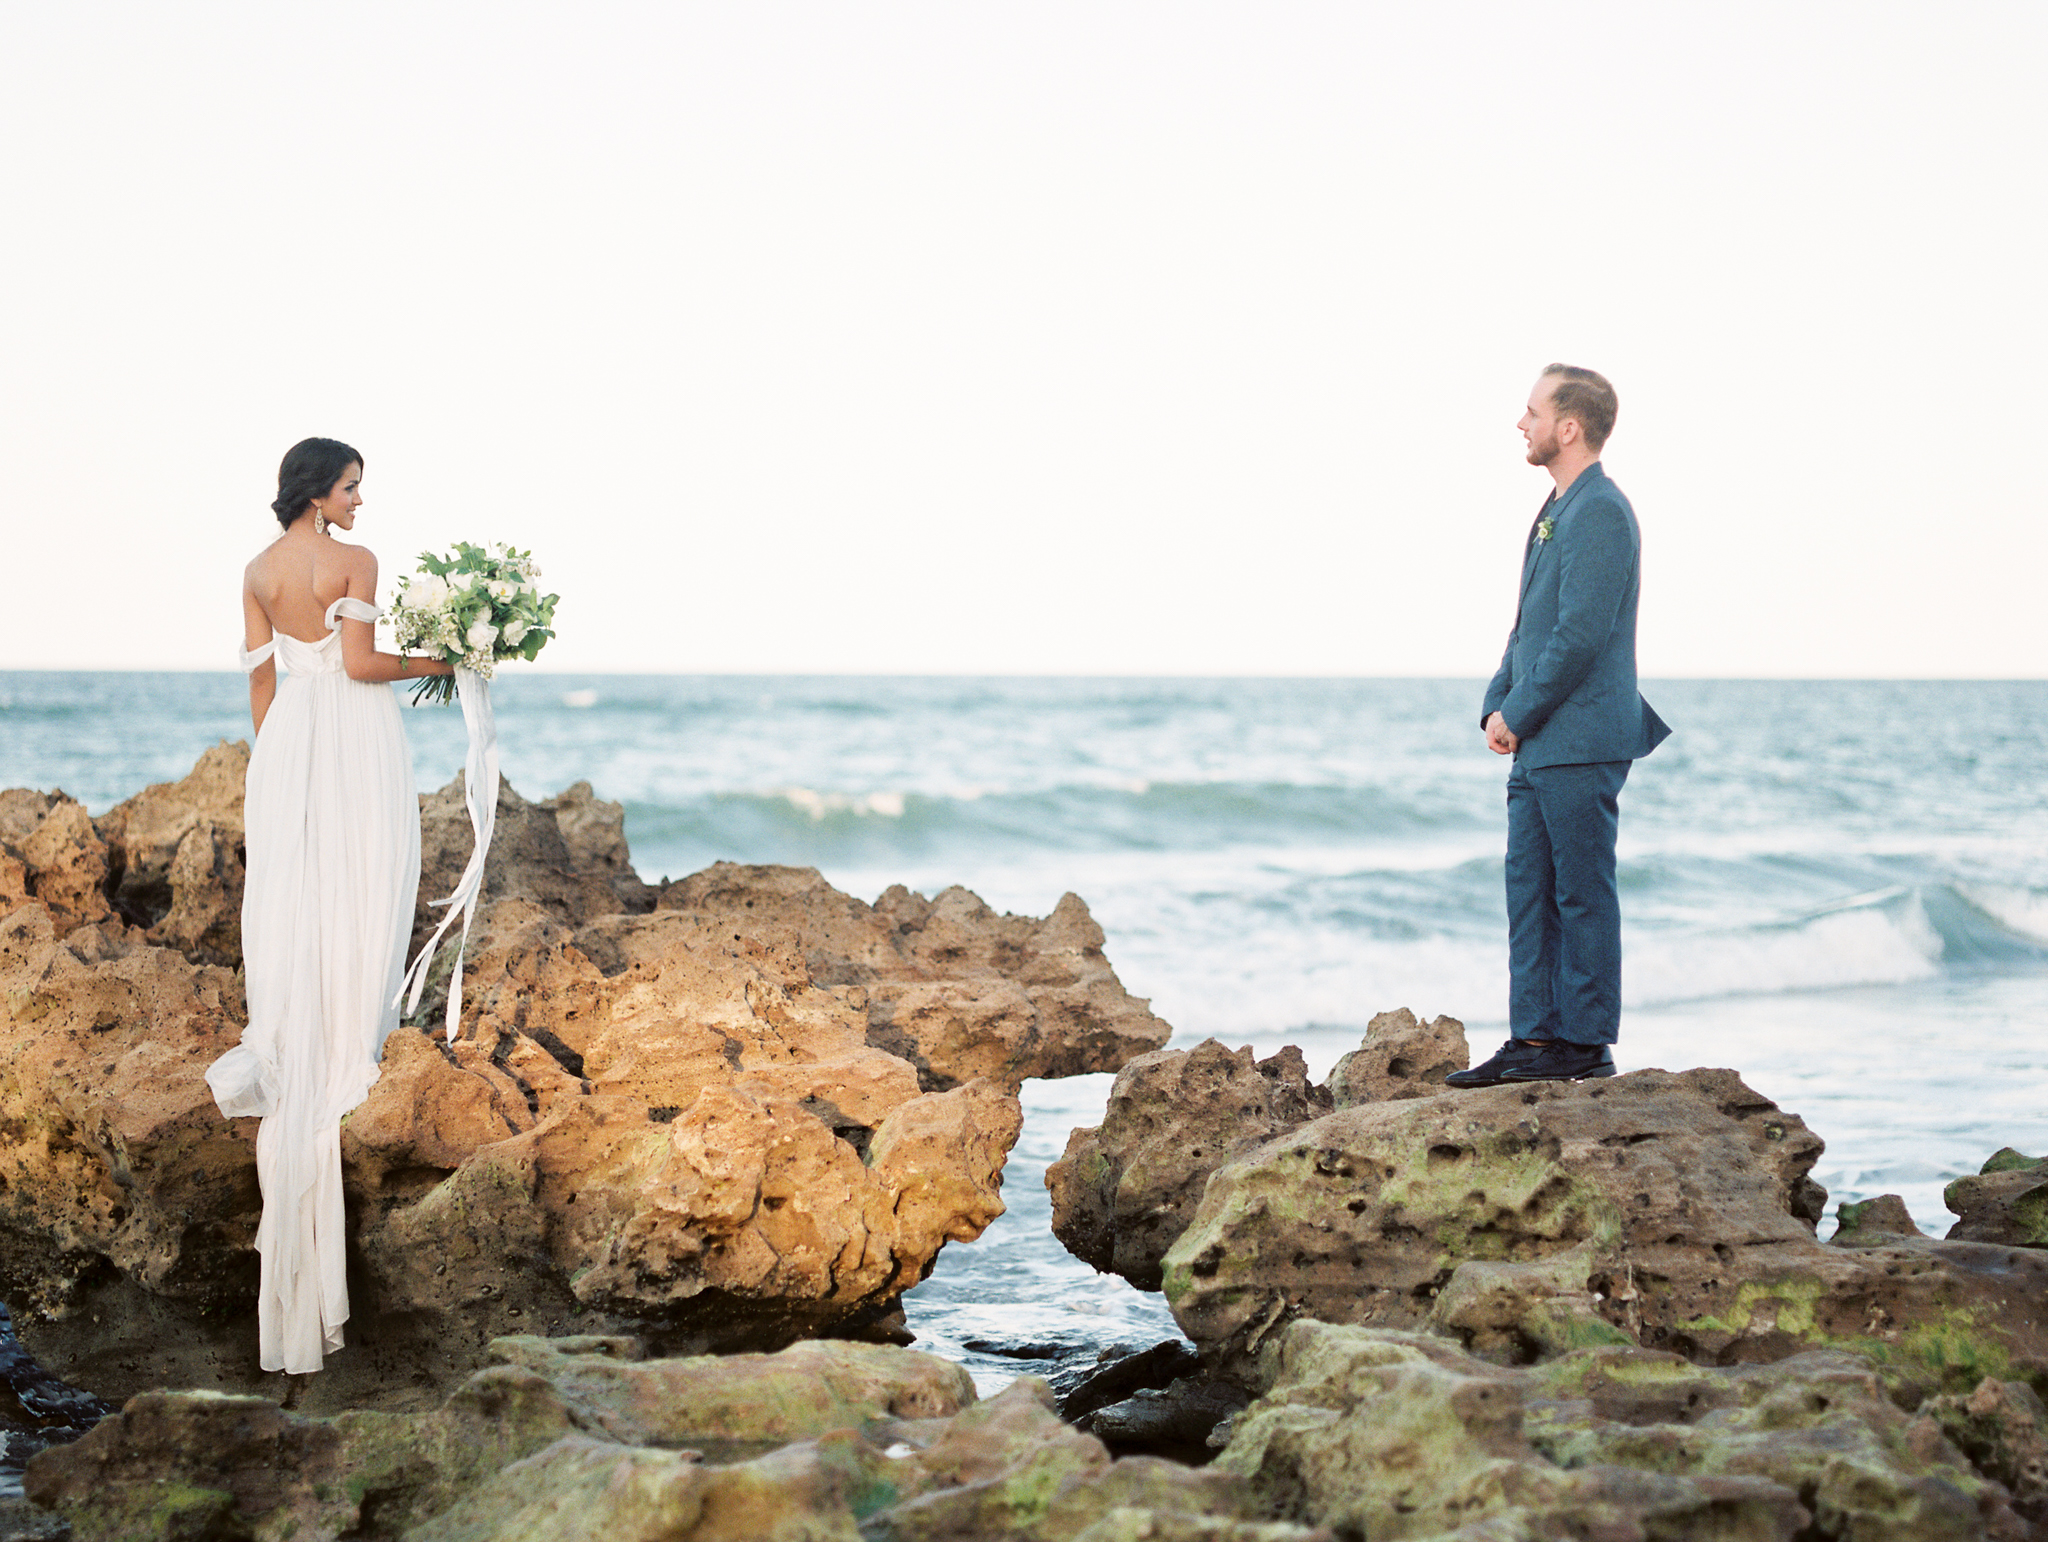 coral cove, jupiter beach FL, palm beach wedding photos, bride and groom on beach rocks